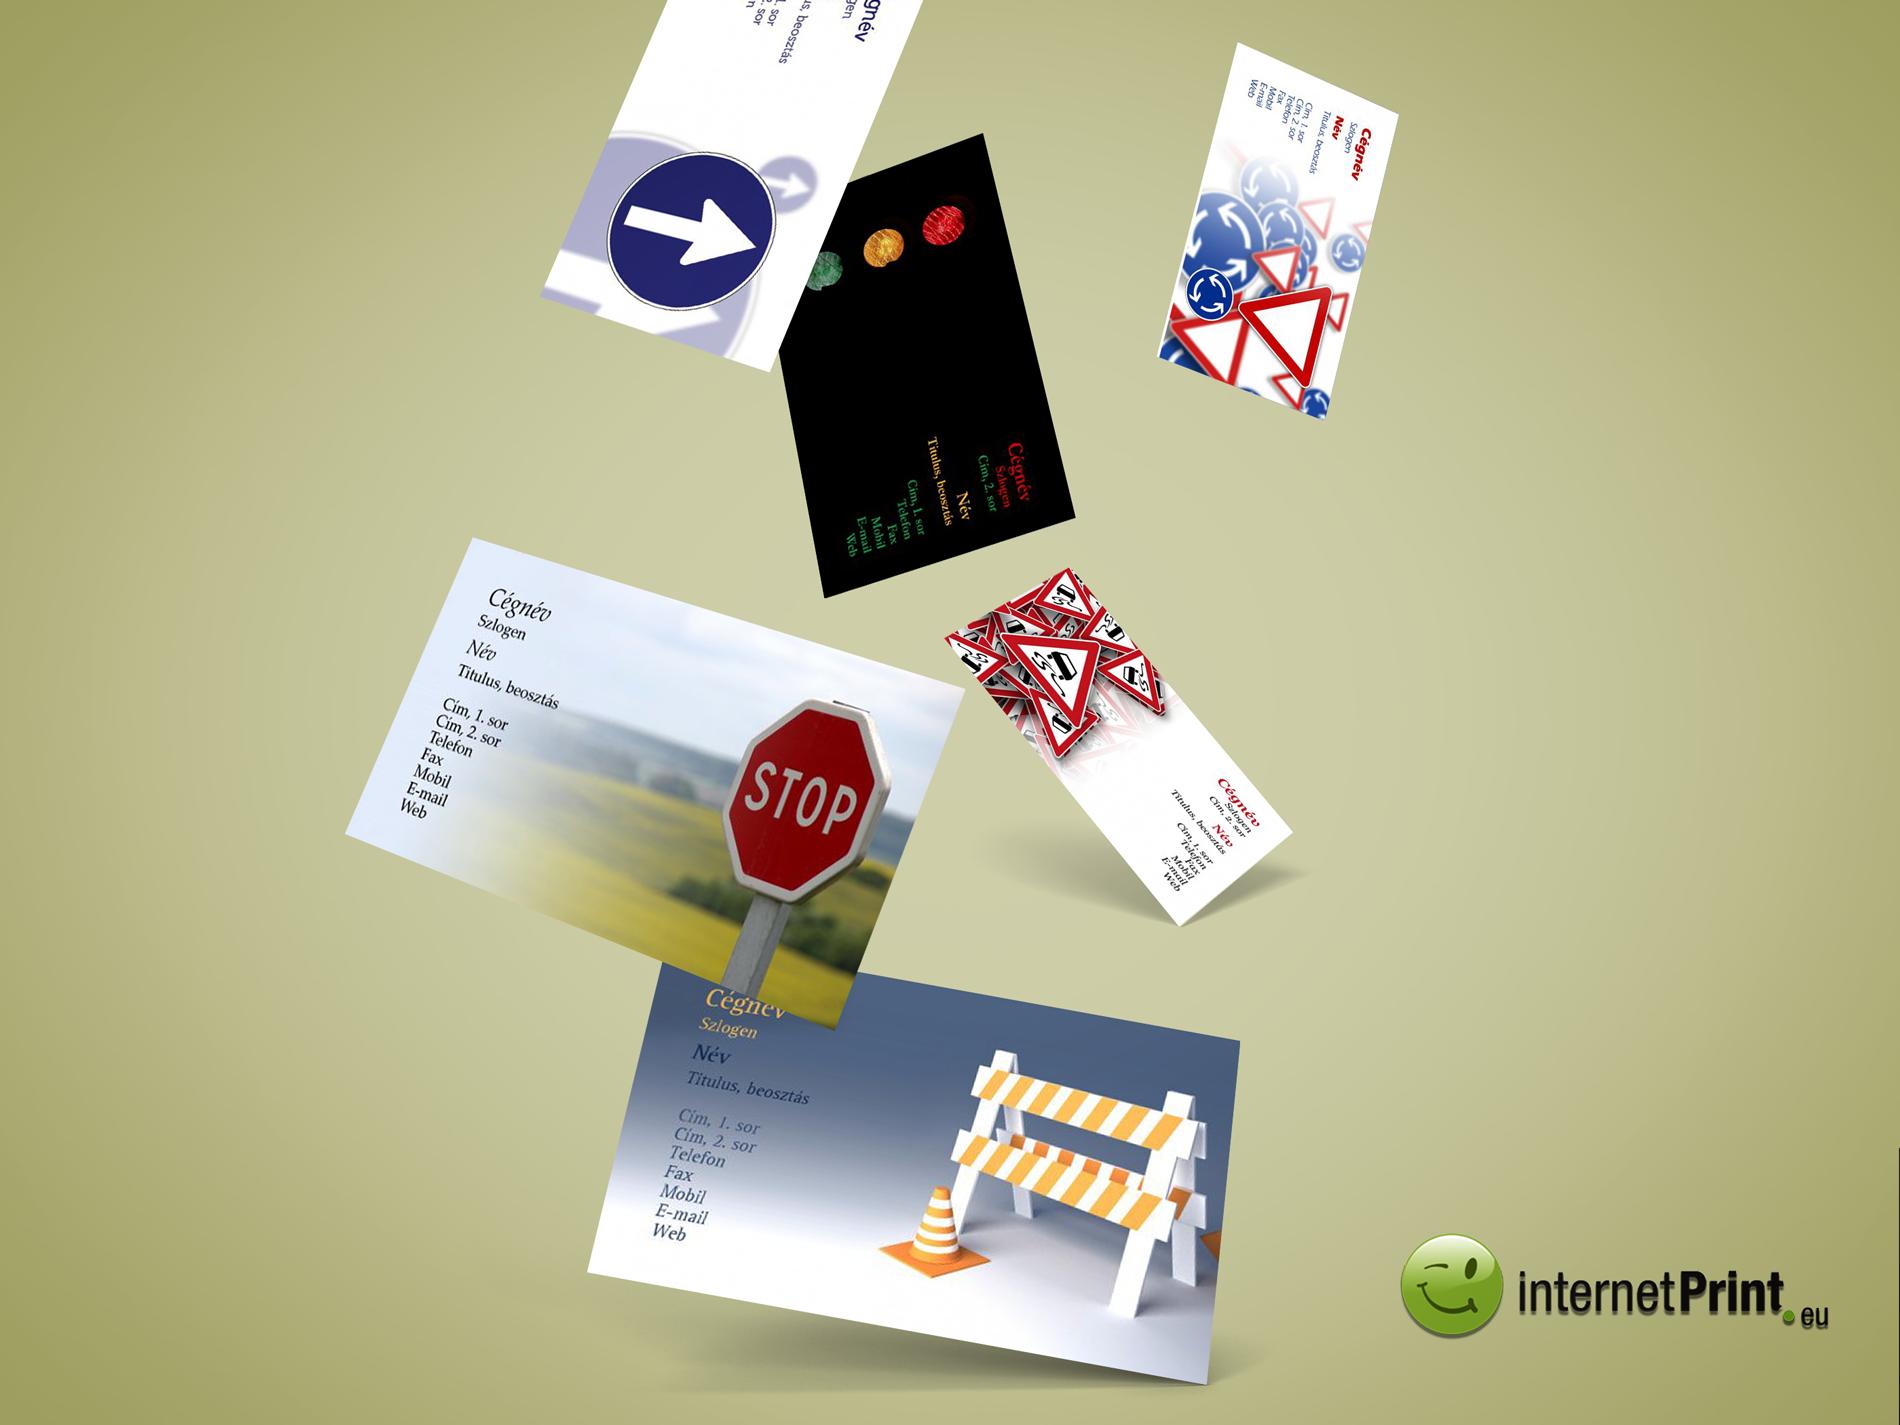 Legjabb nvjegykrtya minta latest business card template legjabb nvjegykrtya minta latest business card template magicingreecefo Gallery